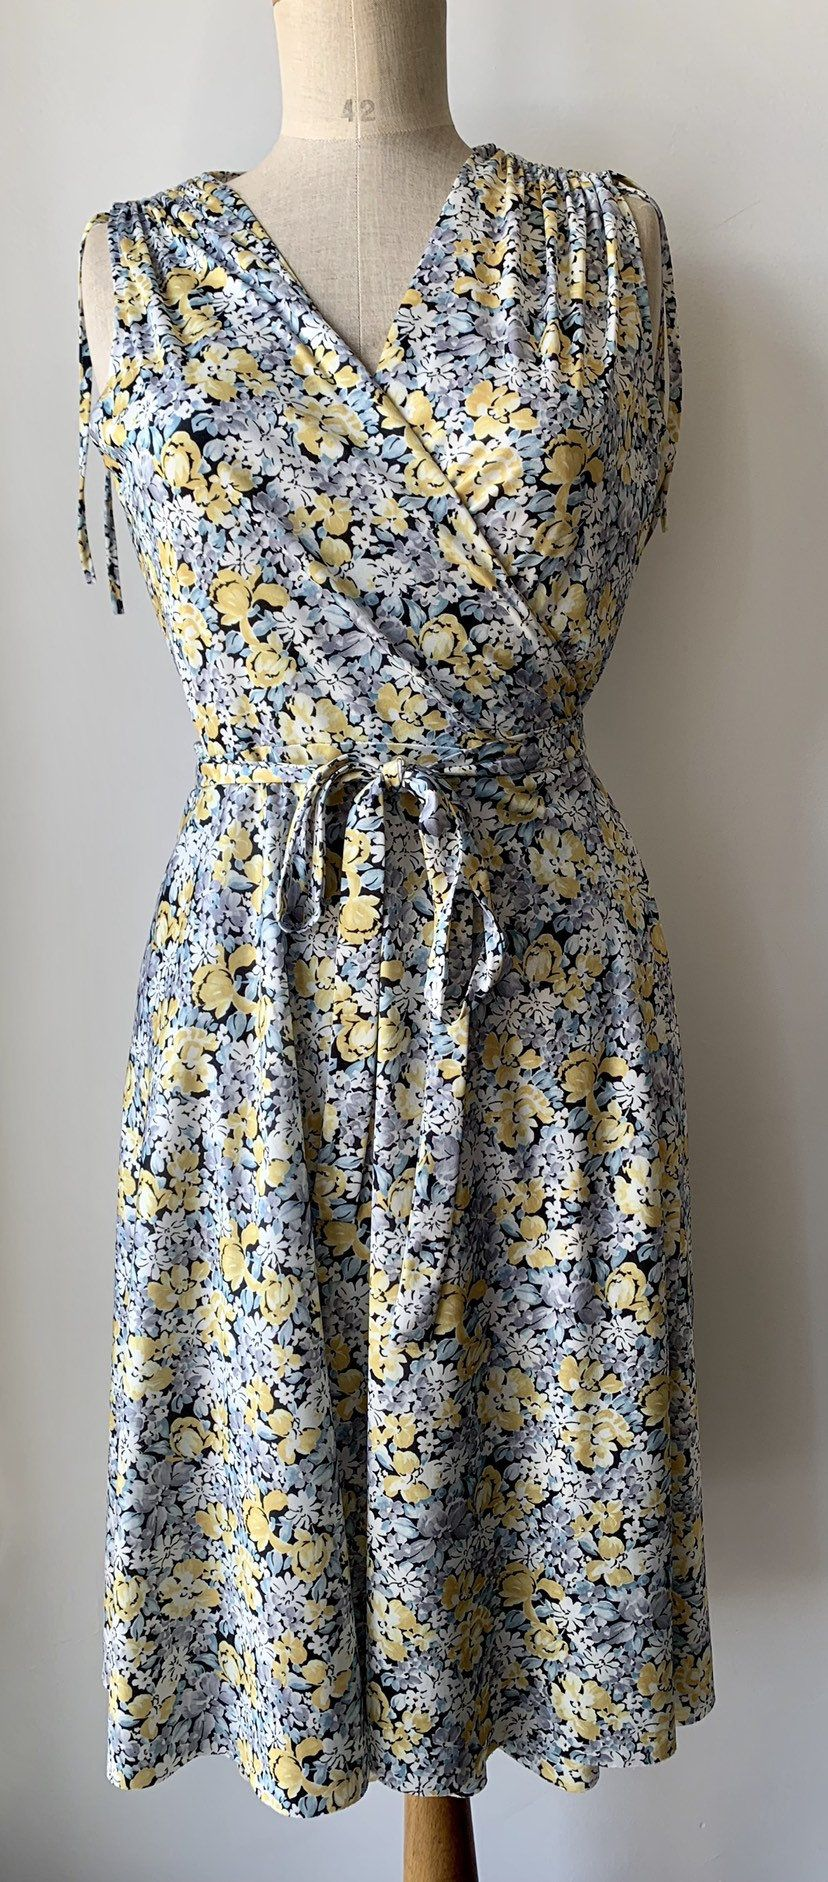 Summer vibes ?️?️?️ now available online: Pale yellow blue wrap dress, #weddingguest #dress explore…